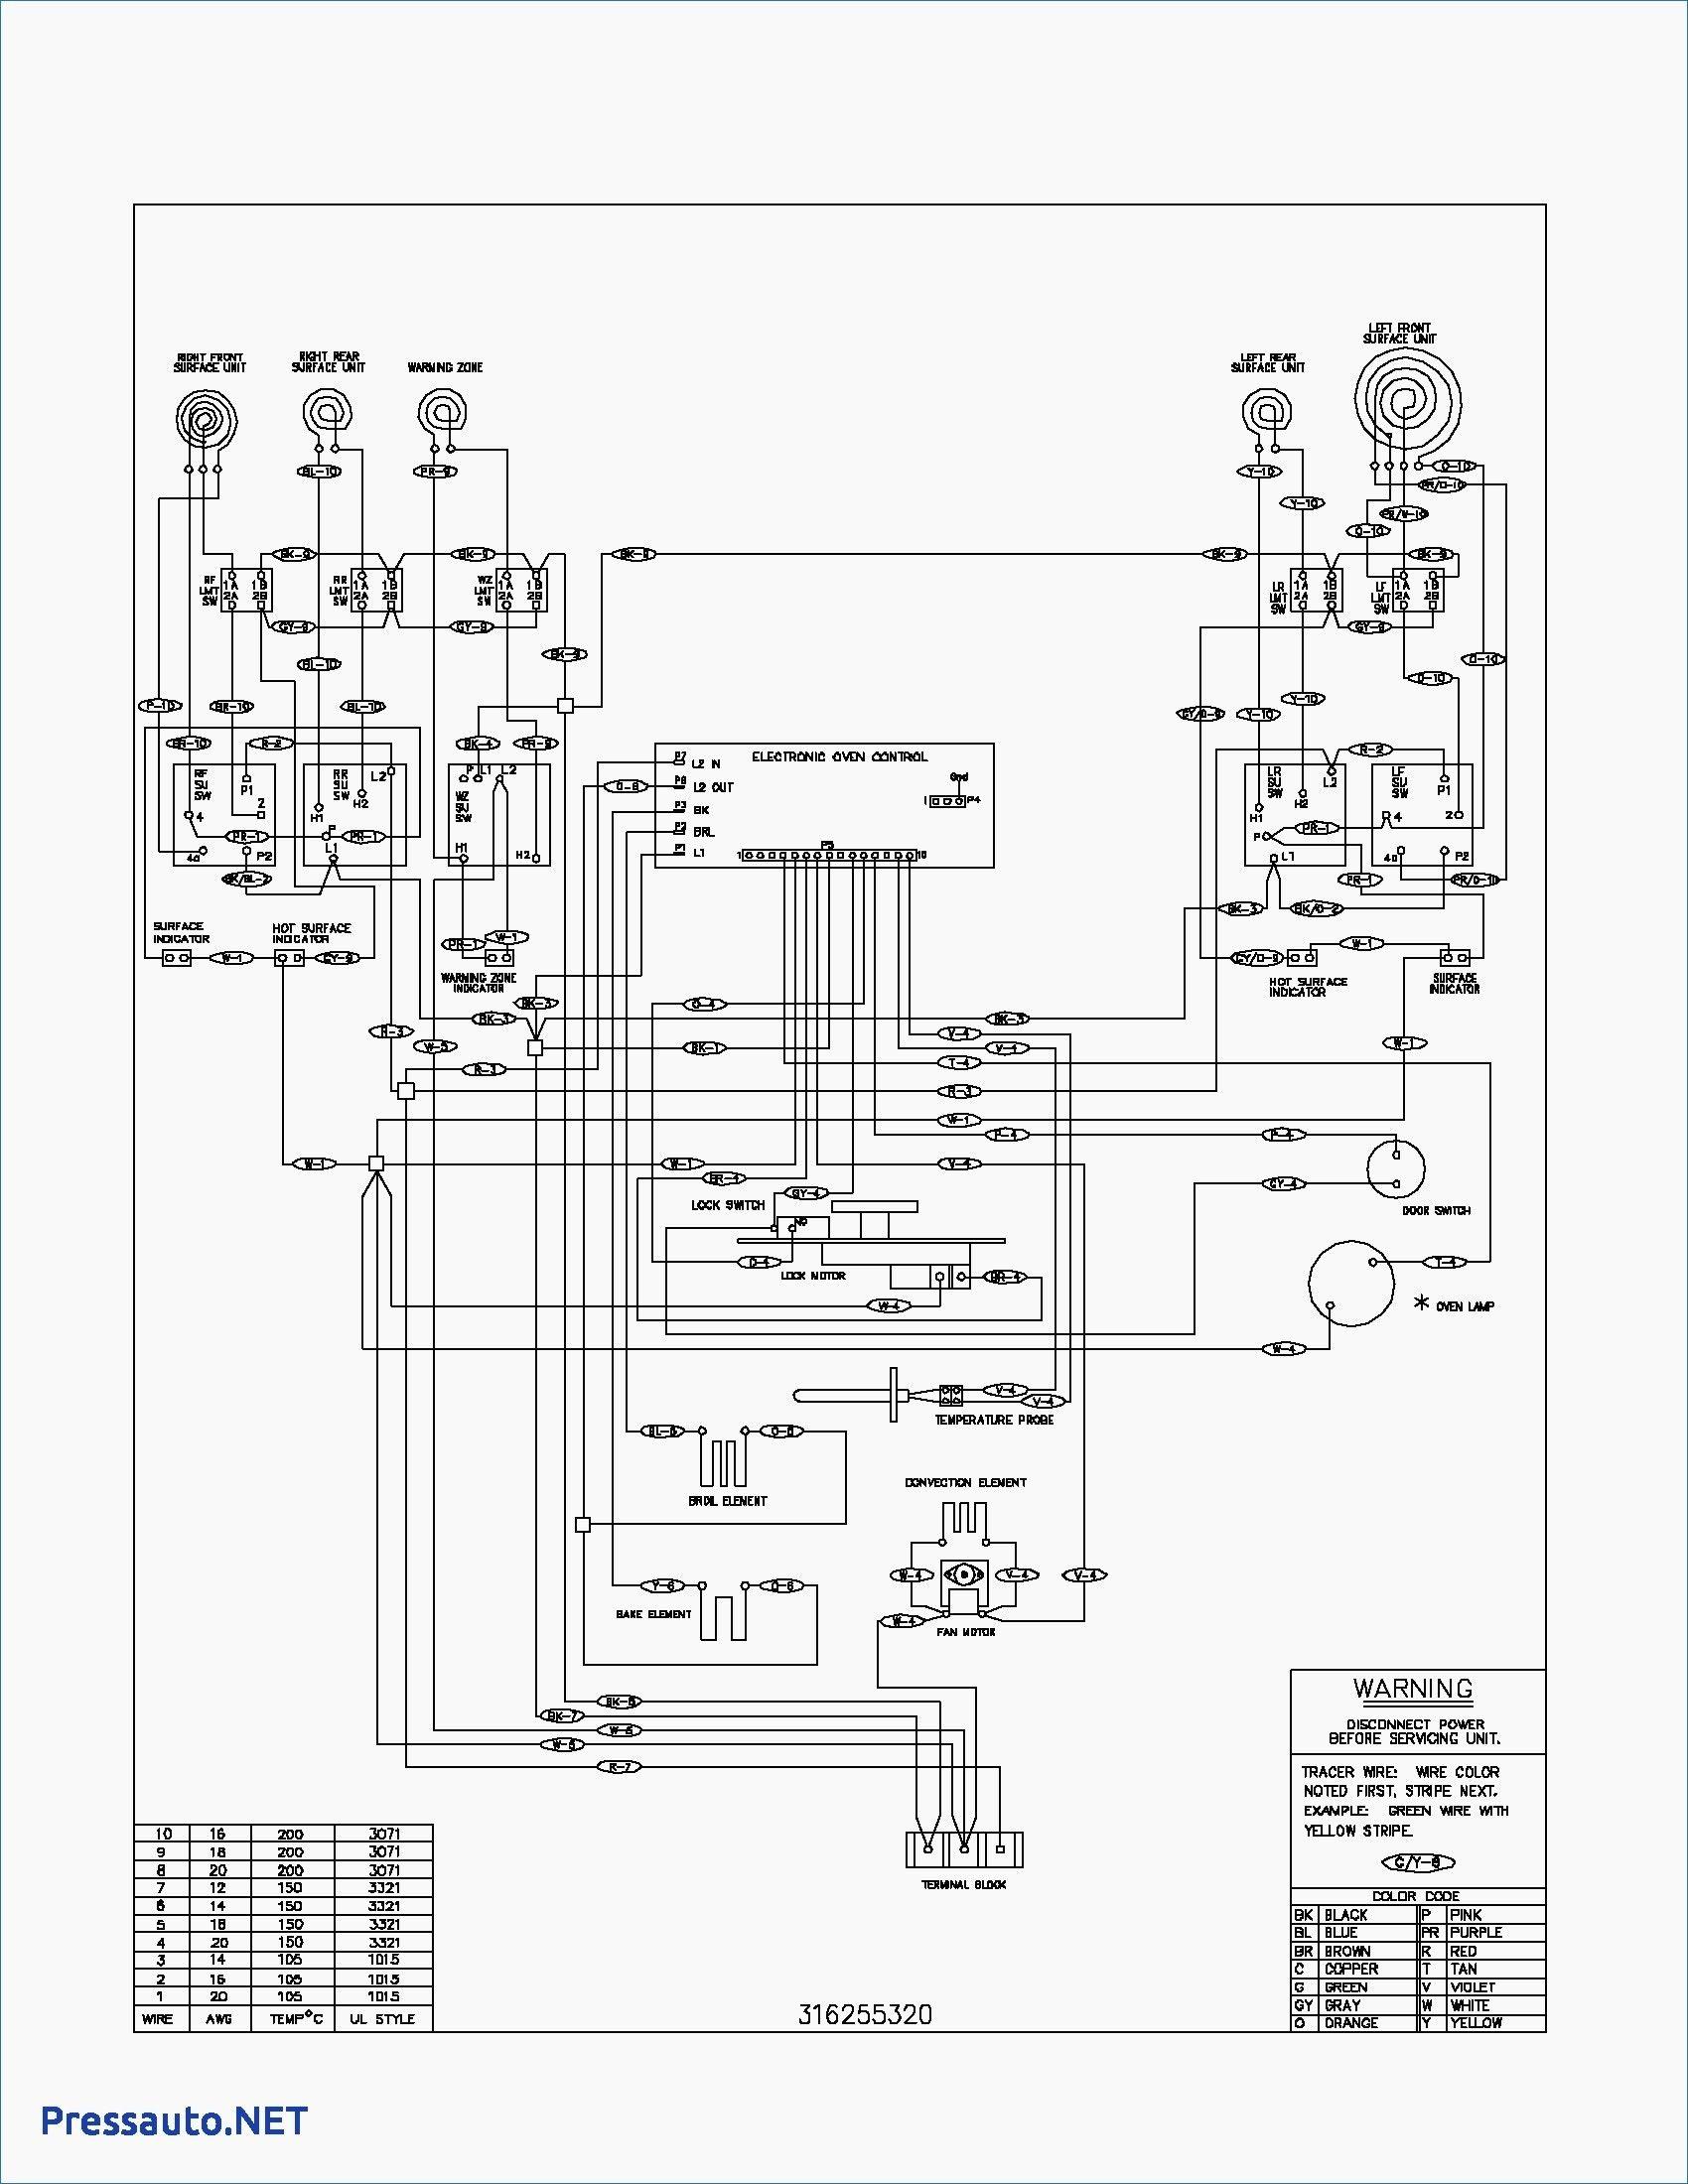 Vz Wiring Diagram For Bosch Electric Hob Free